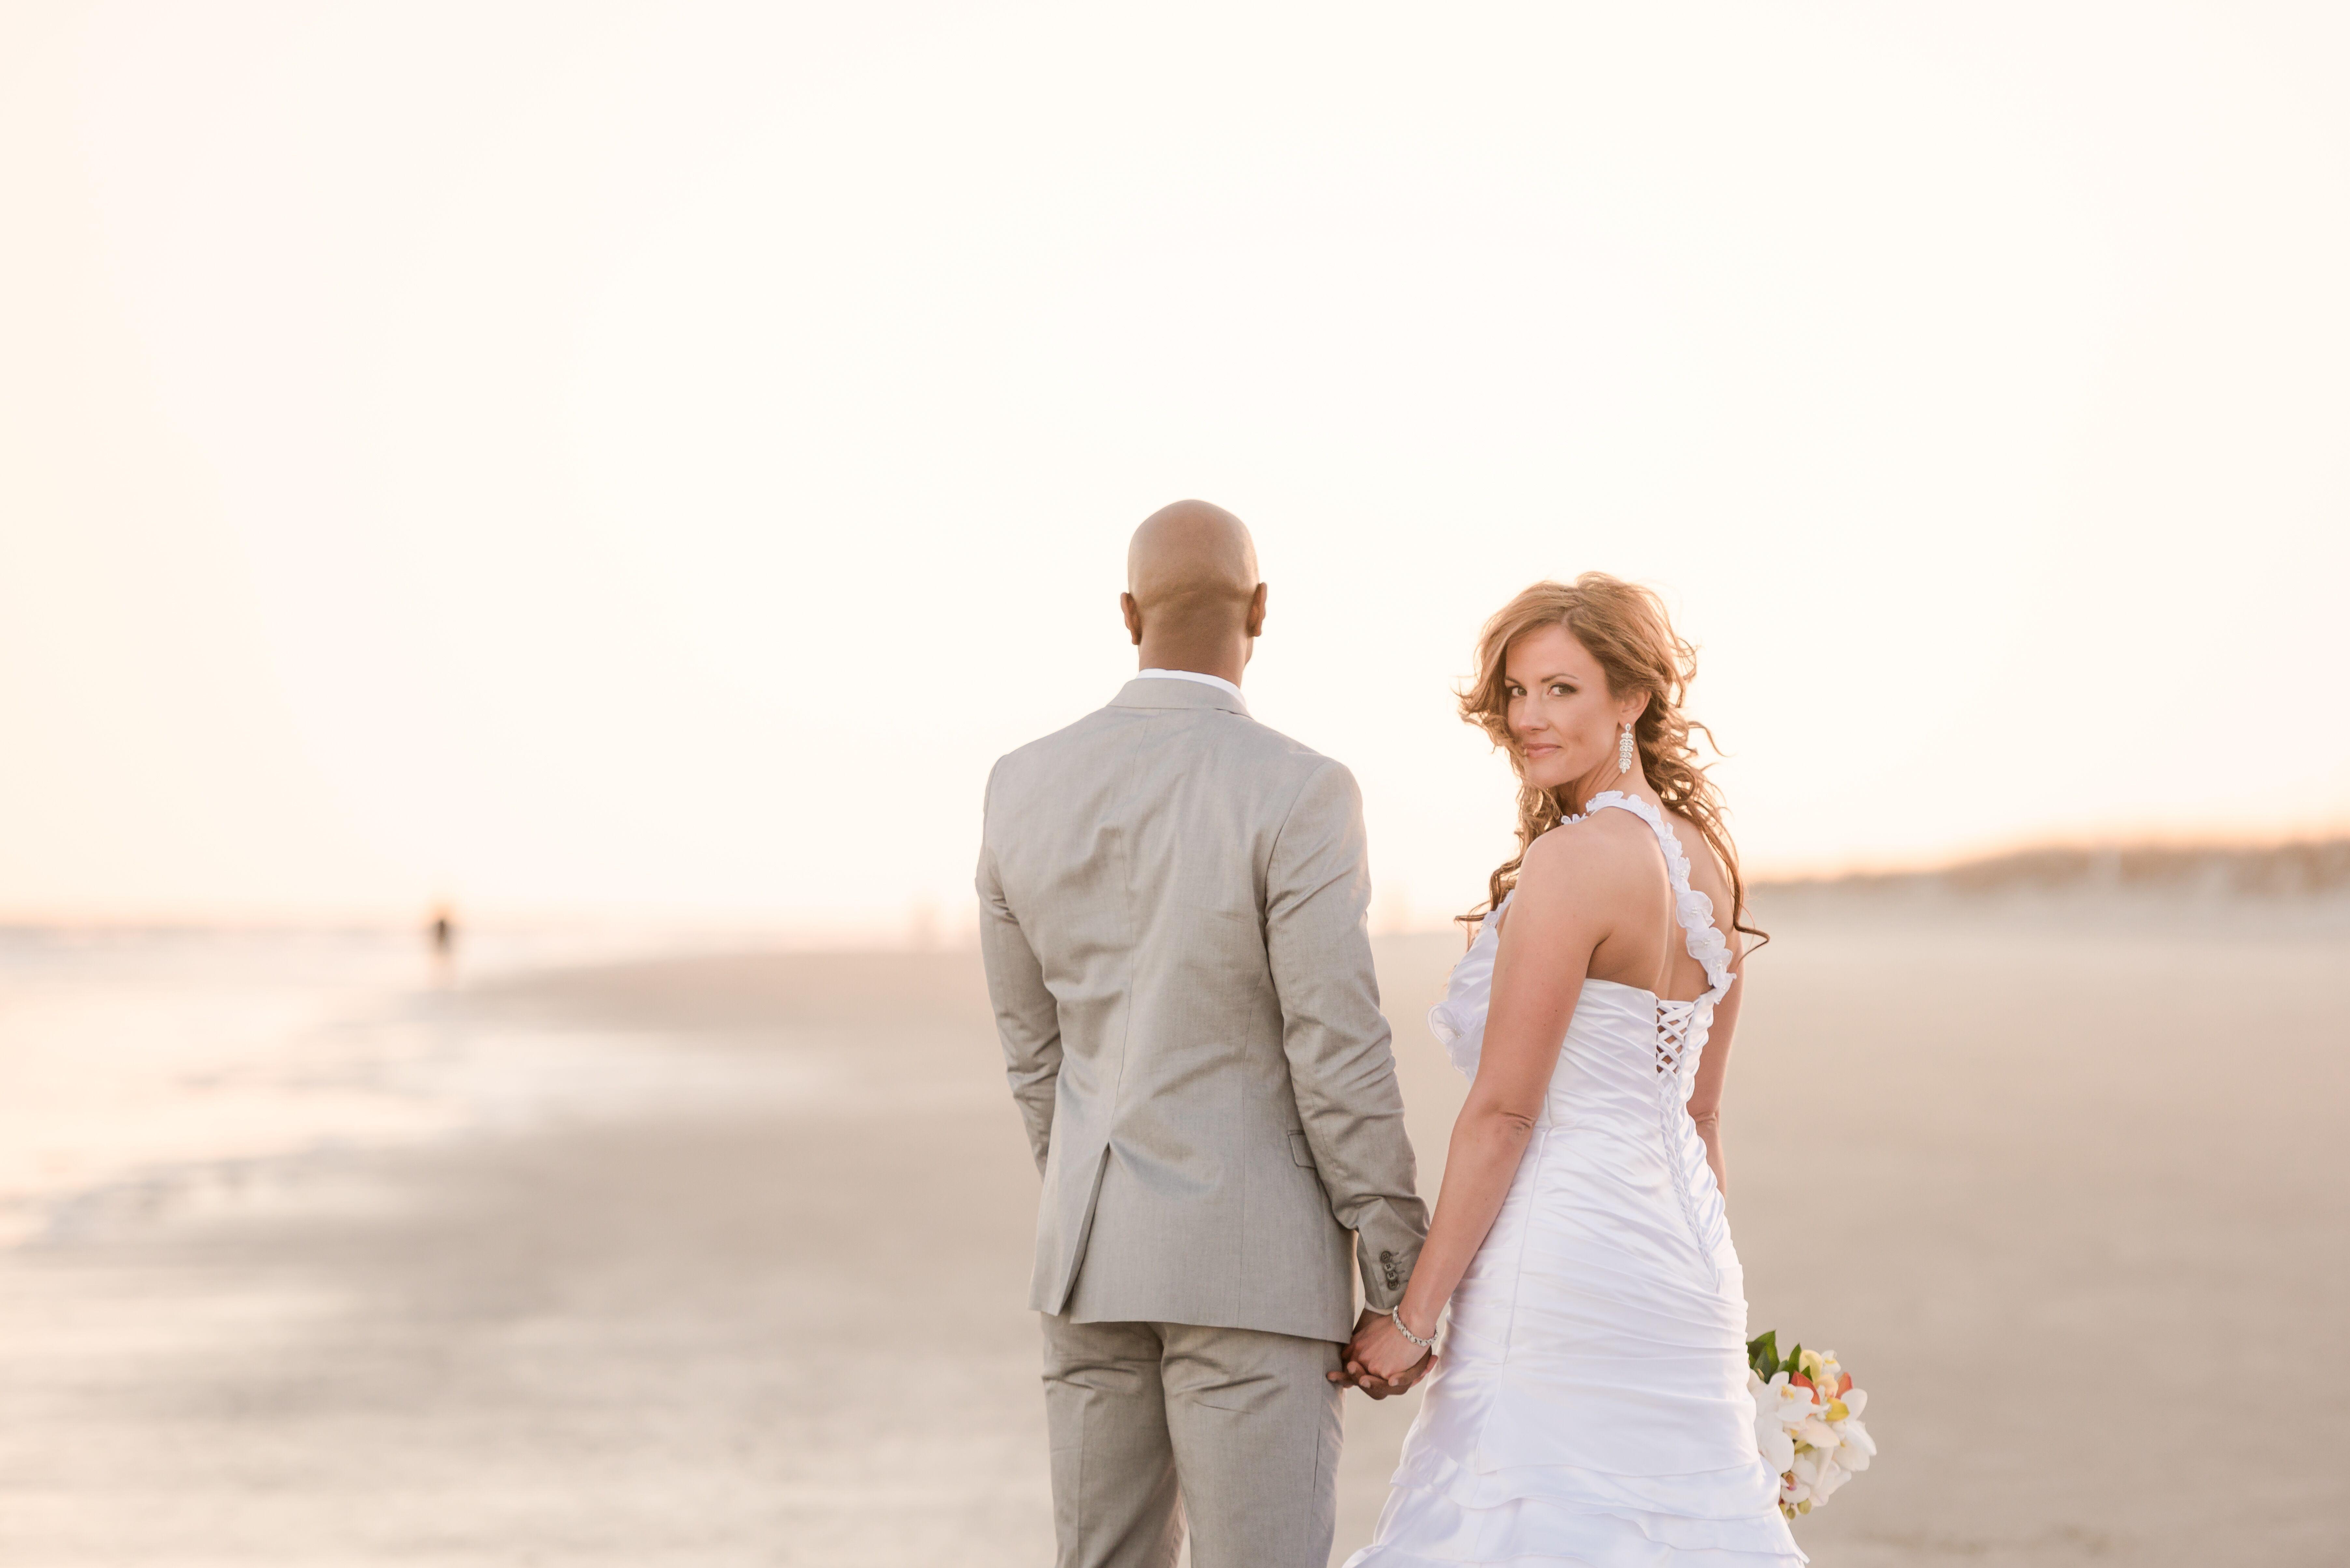 African american wedding photos a pretty beach wedding at omni oceanfront resort in hilton head island south carolina ombrellifo Gallery